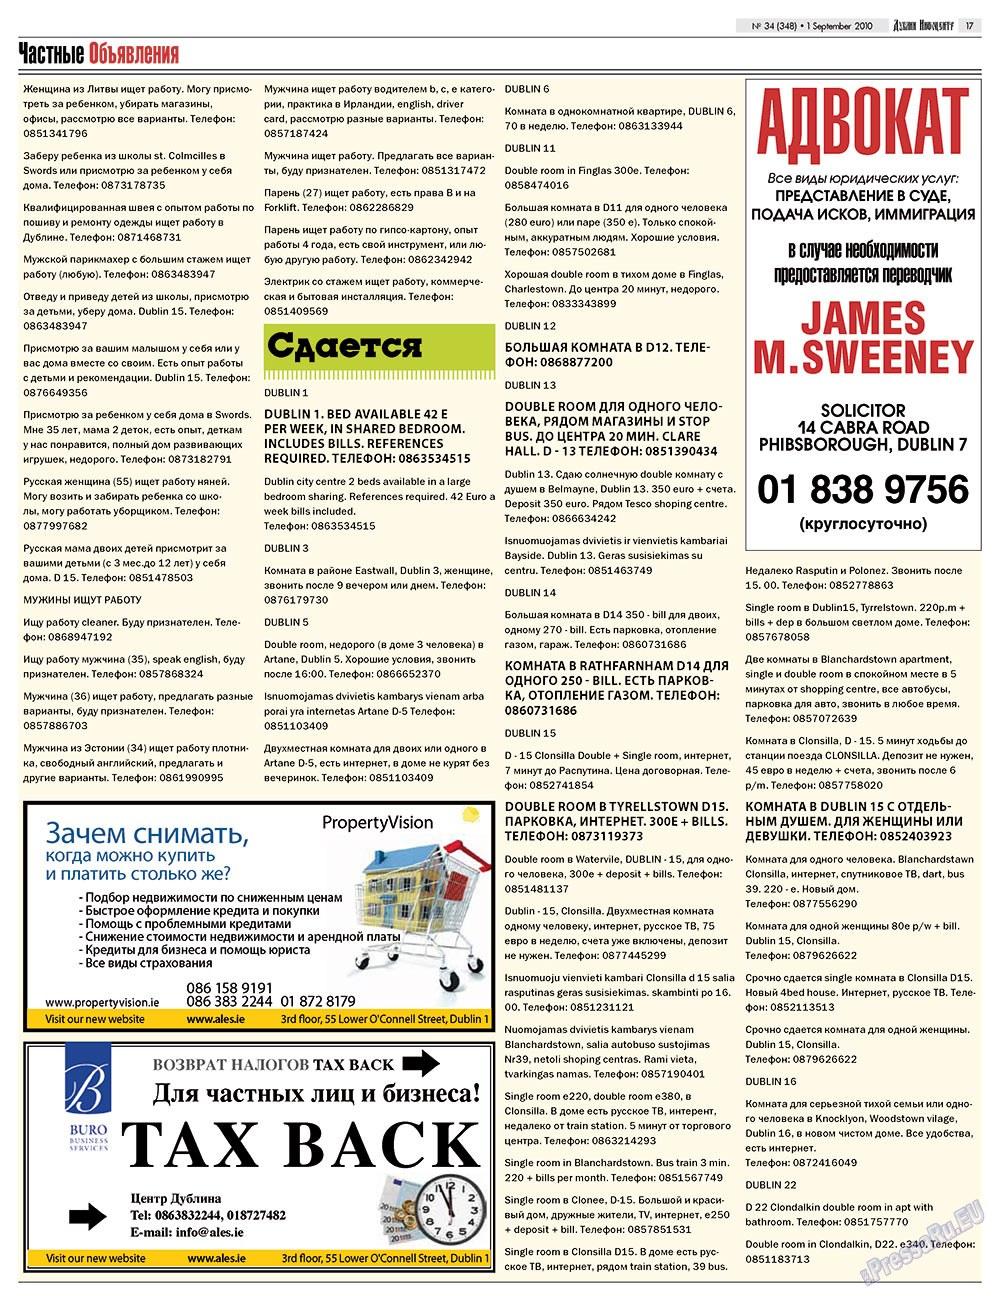 Дублин инфоцентр (газета). 2010 год, номер 34, стр. 17